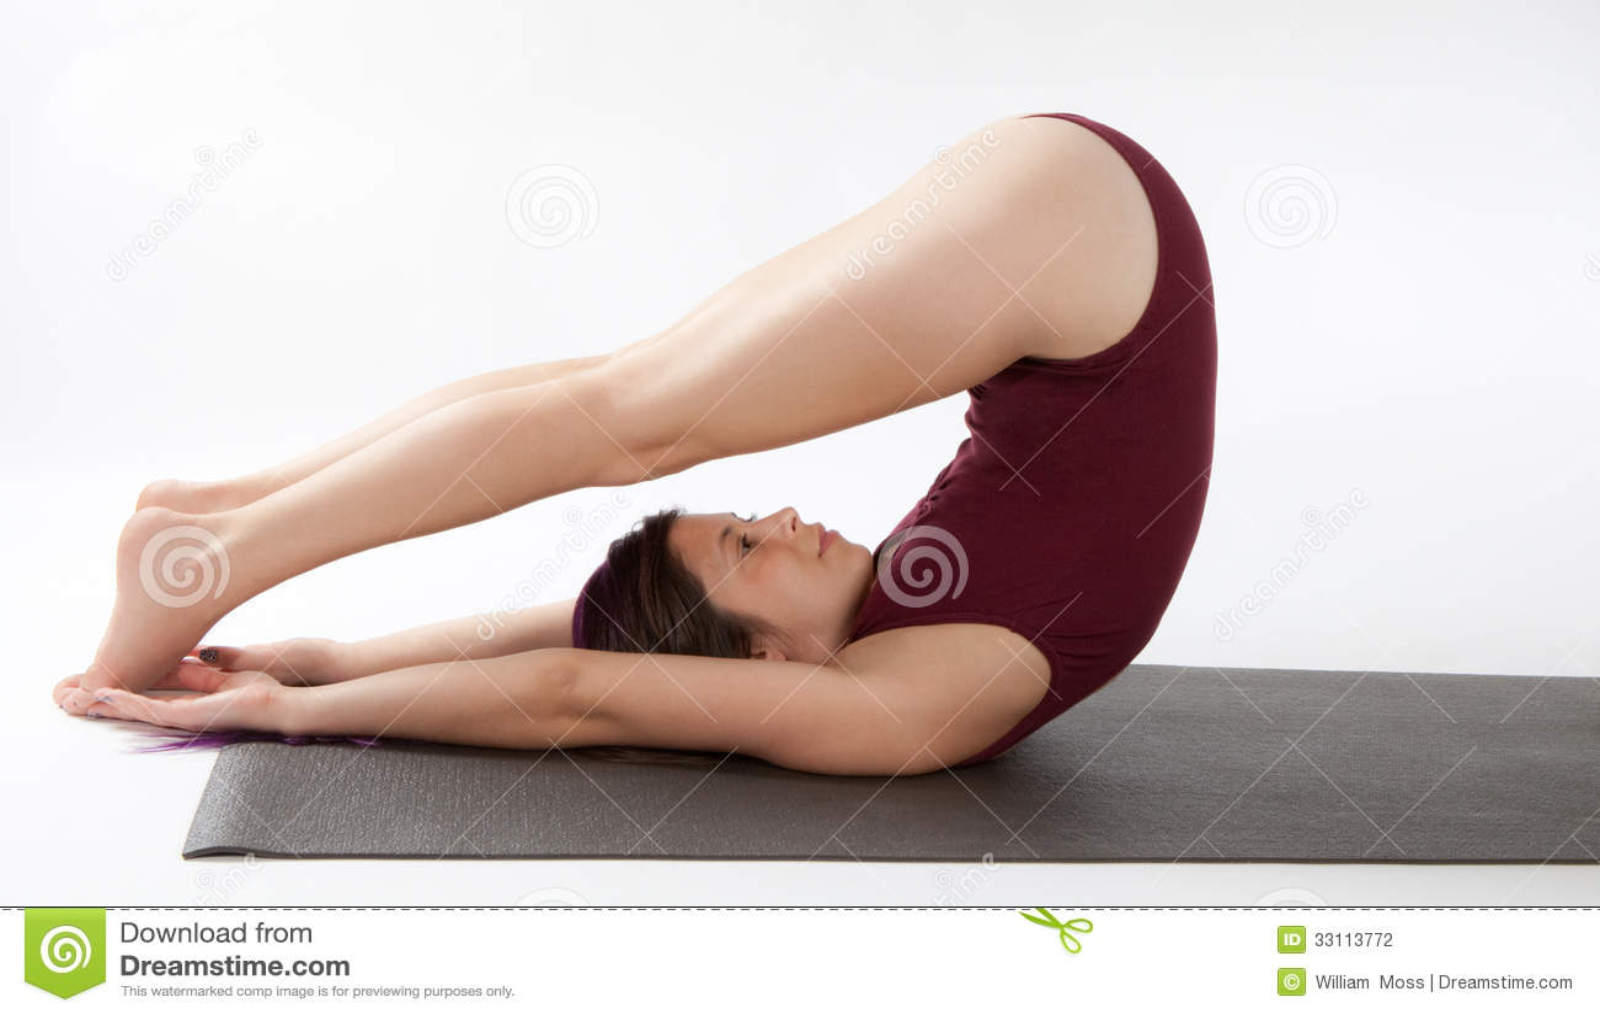 plow pose stock photography image 33113772 gymnastics clipart black gymnastics clipart free